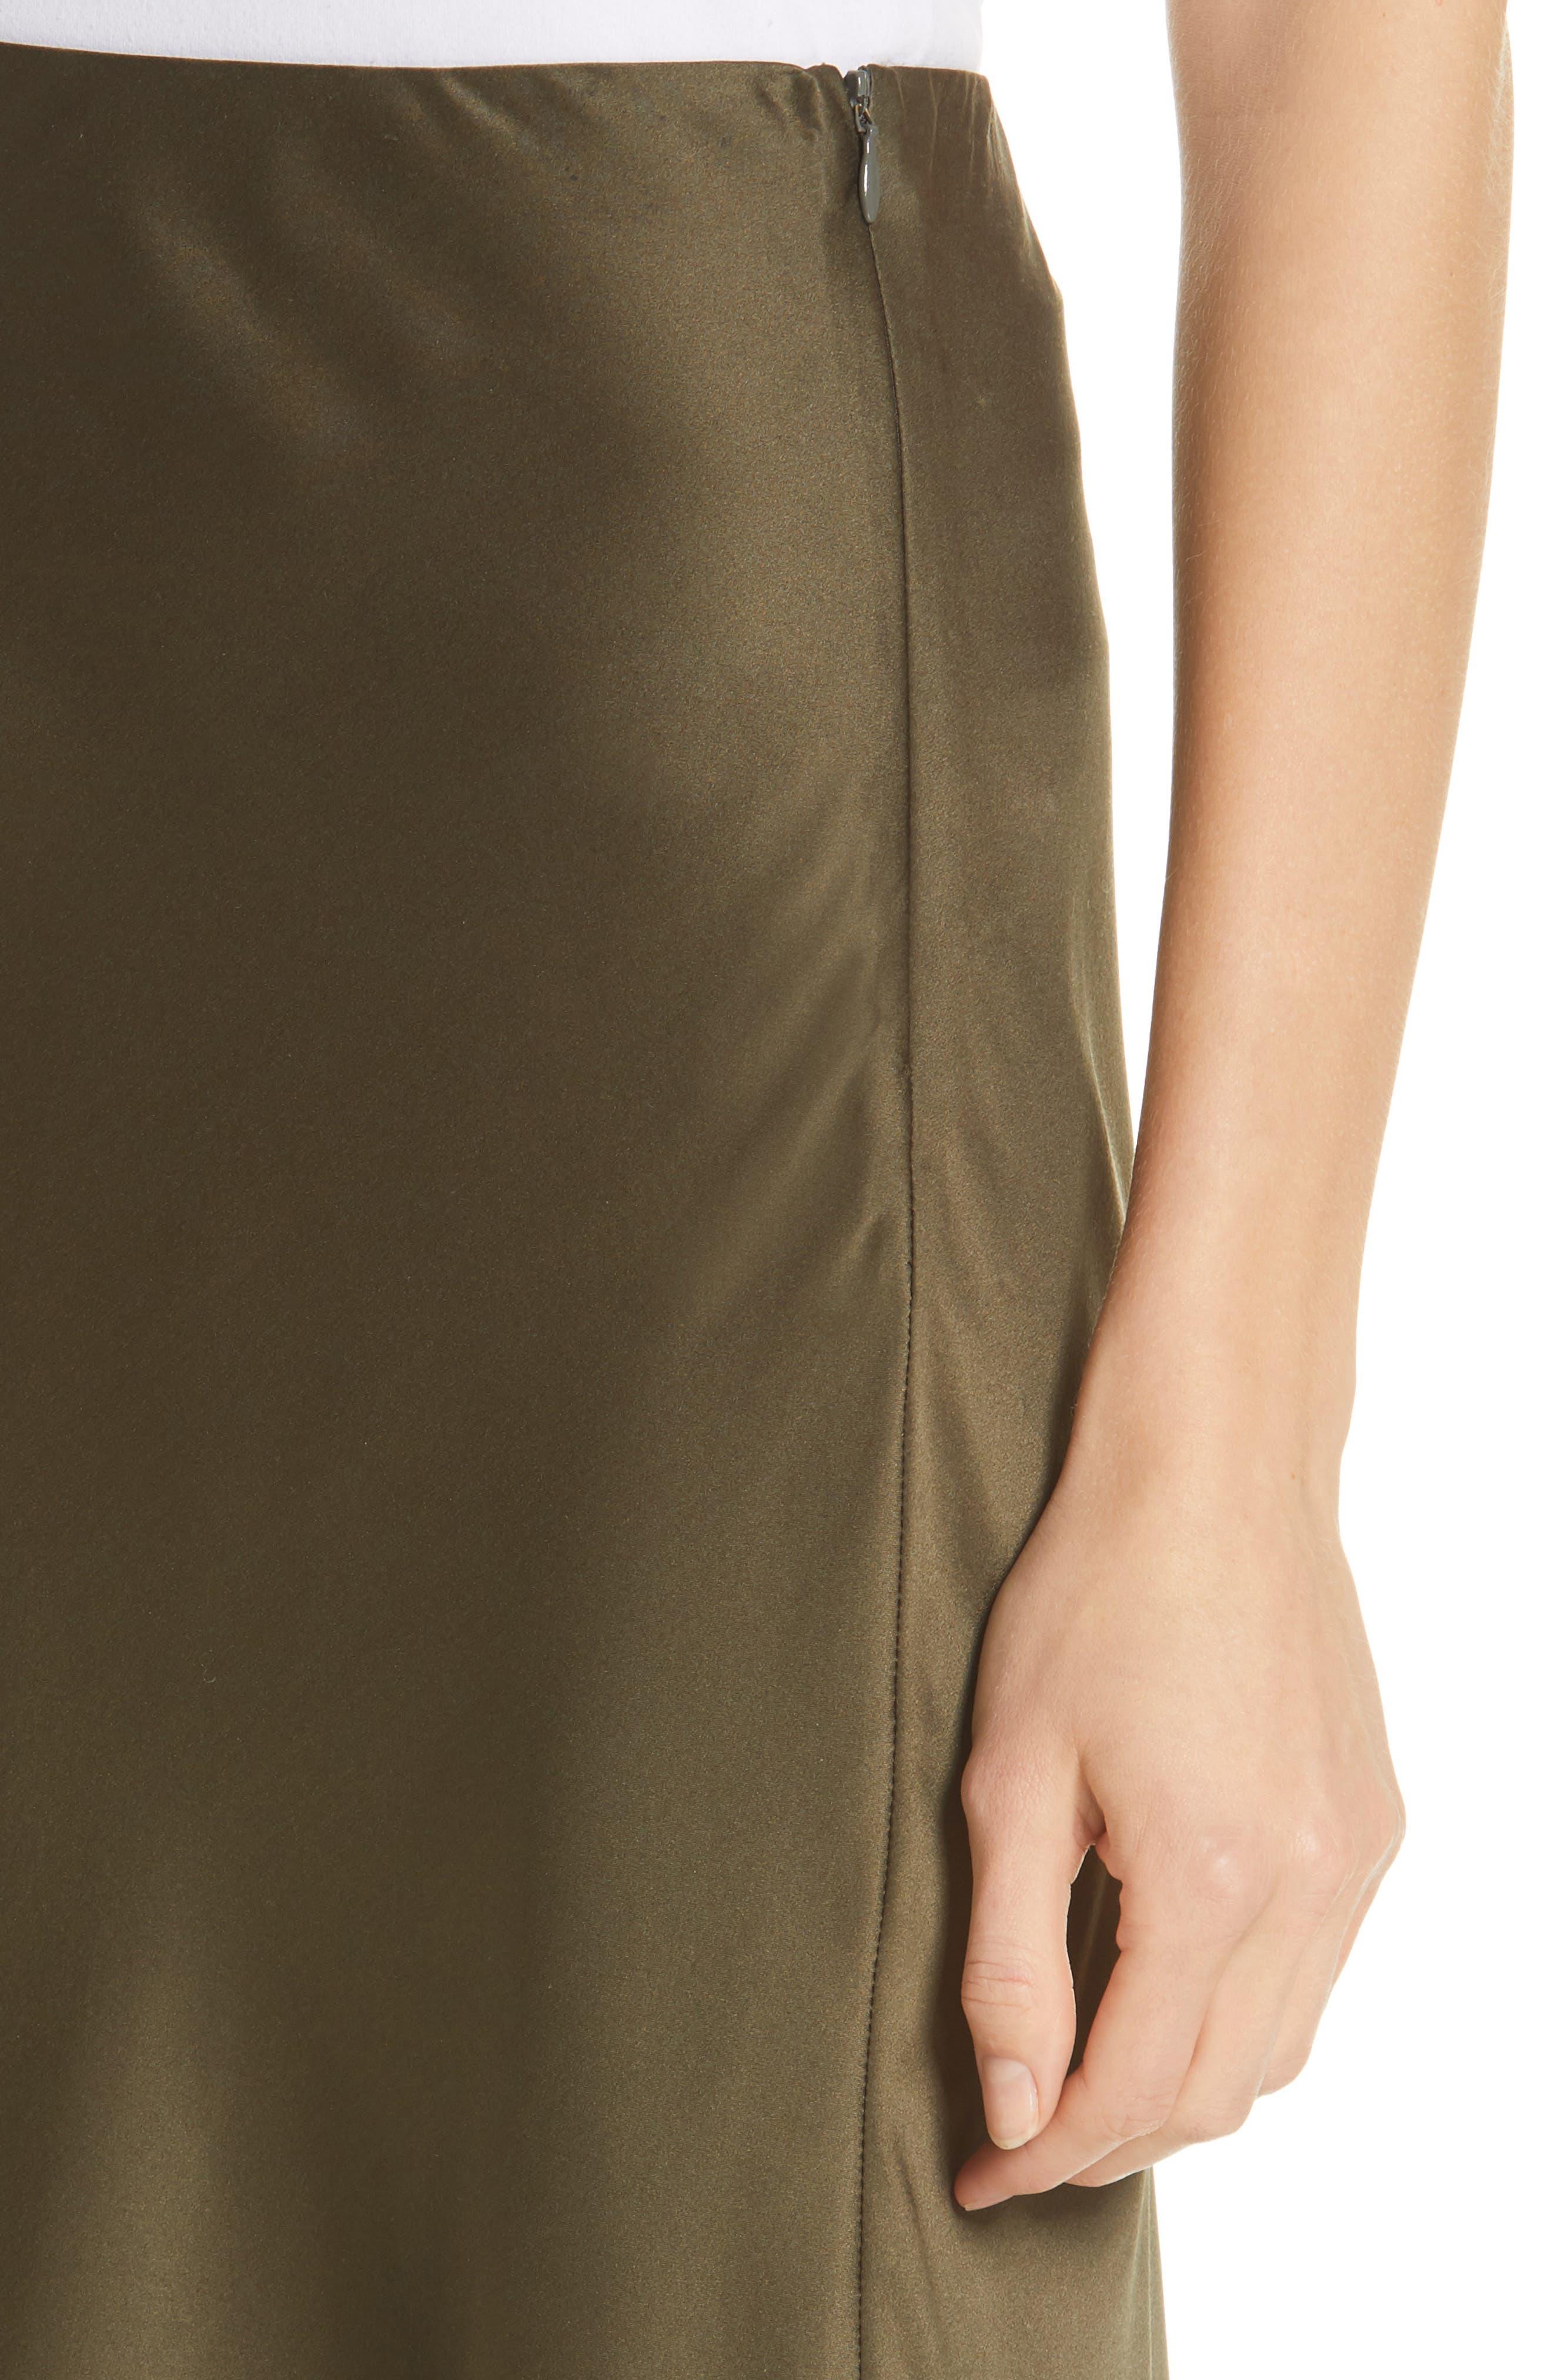 NILI LOTAN, Lane Silk Skirt, Alternate thumbnail 4, color, ARMY GREEN